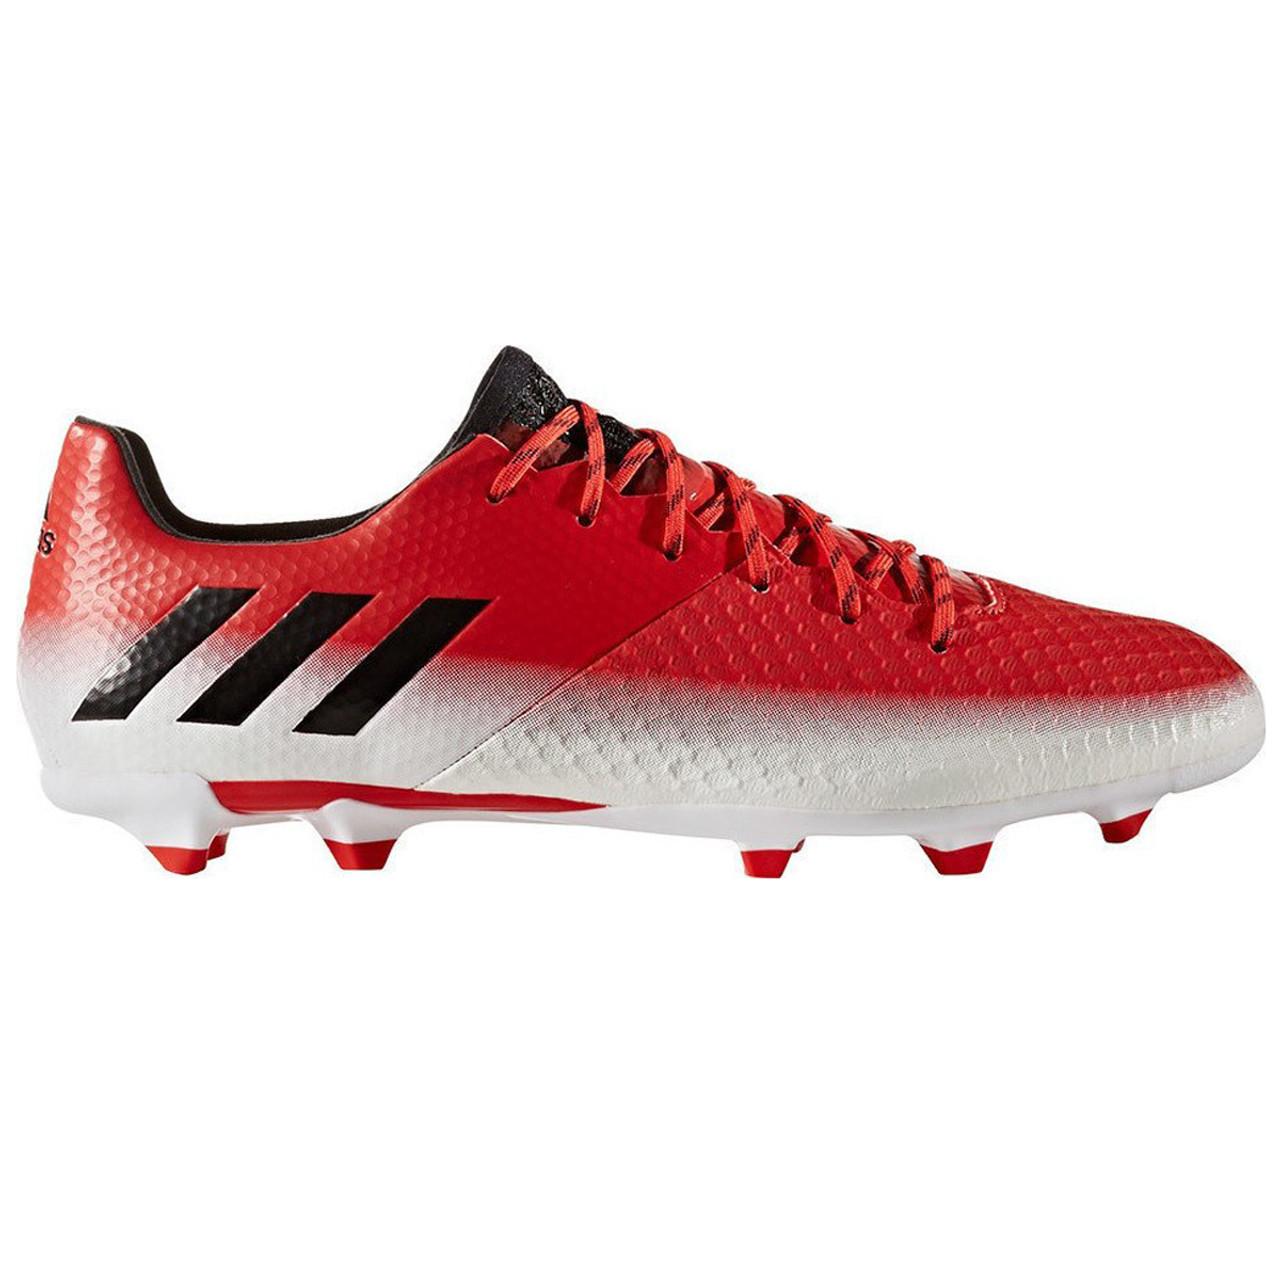 Adidas Messi 16.2 FG Mens Soccer Cleats